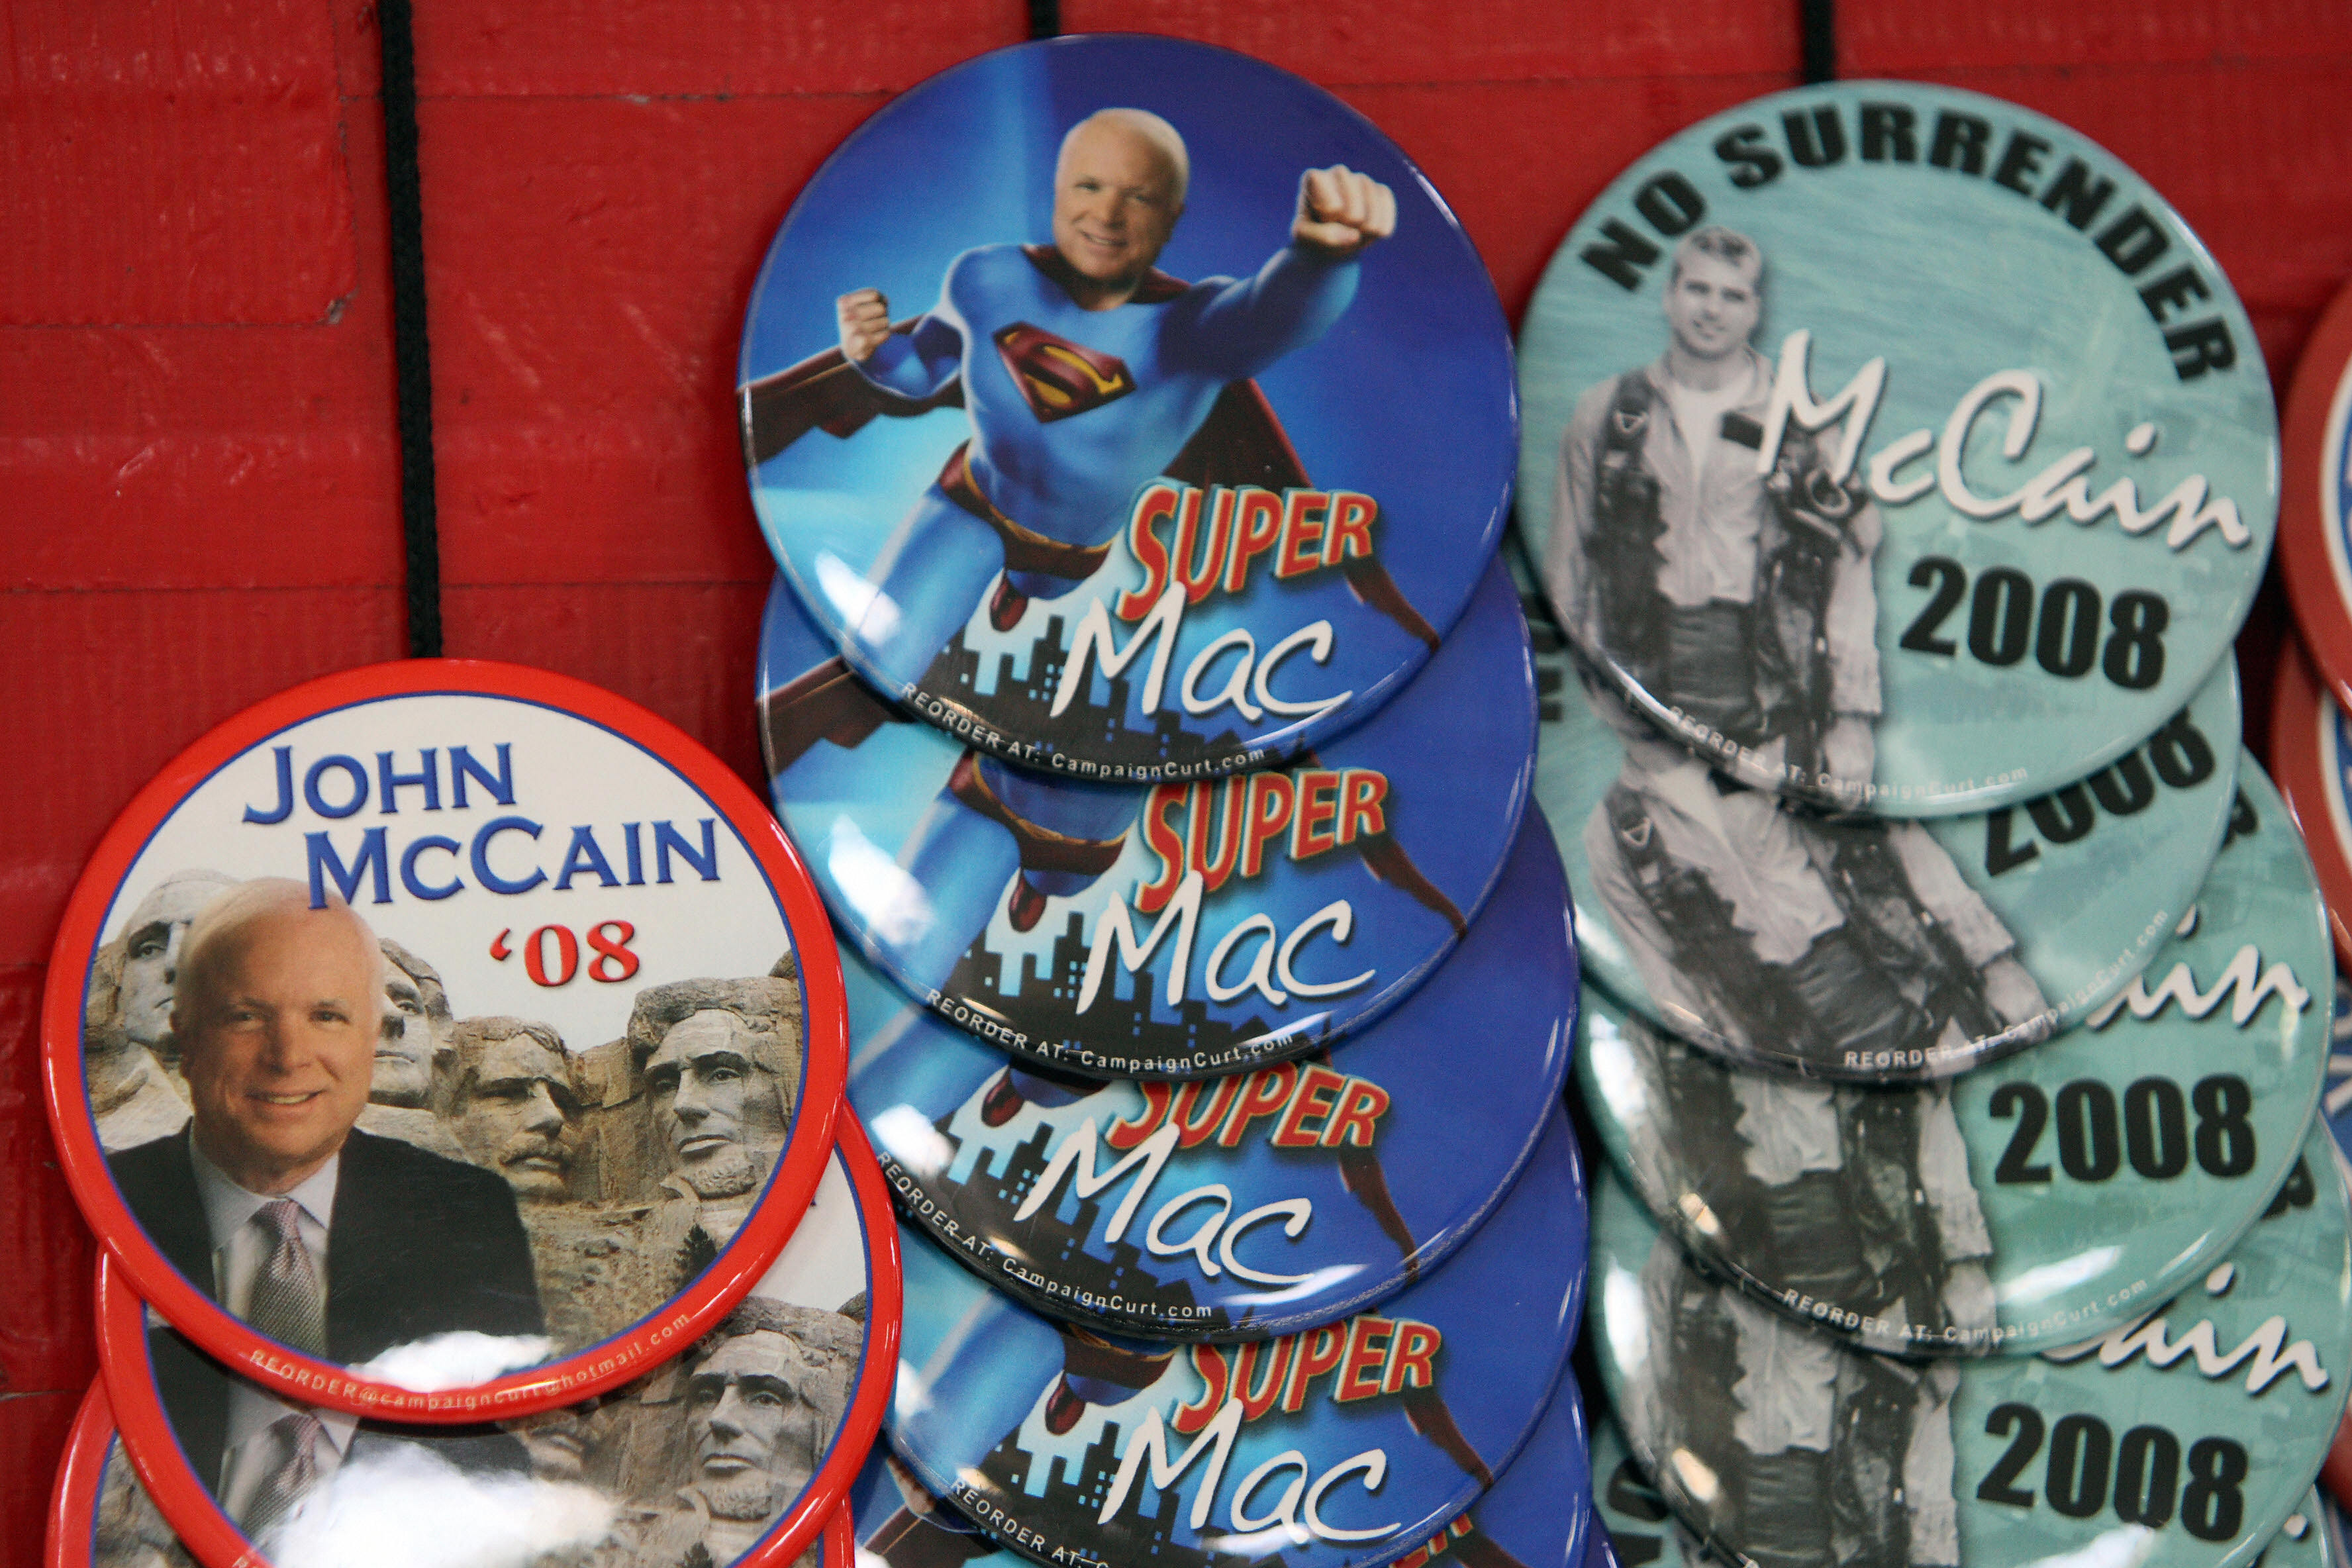 Sen. John McCain, Former Presidential Nominee And Prisoner Of War, Dies At 81